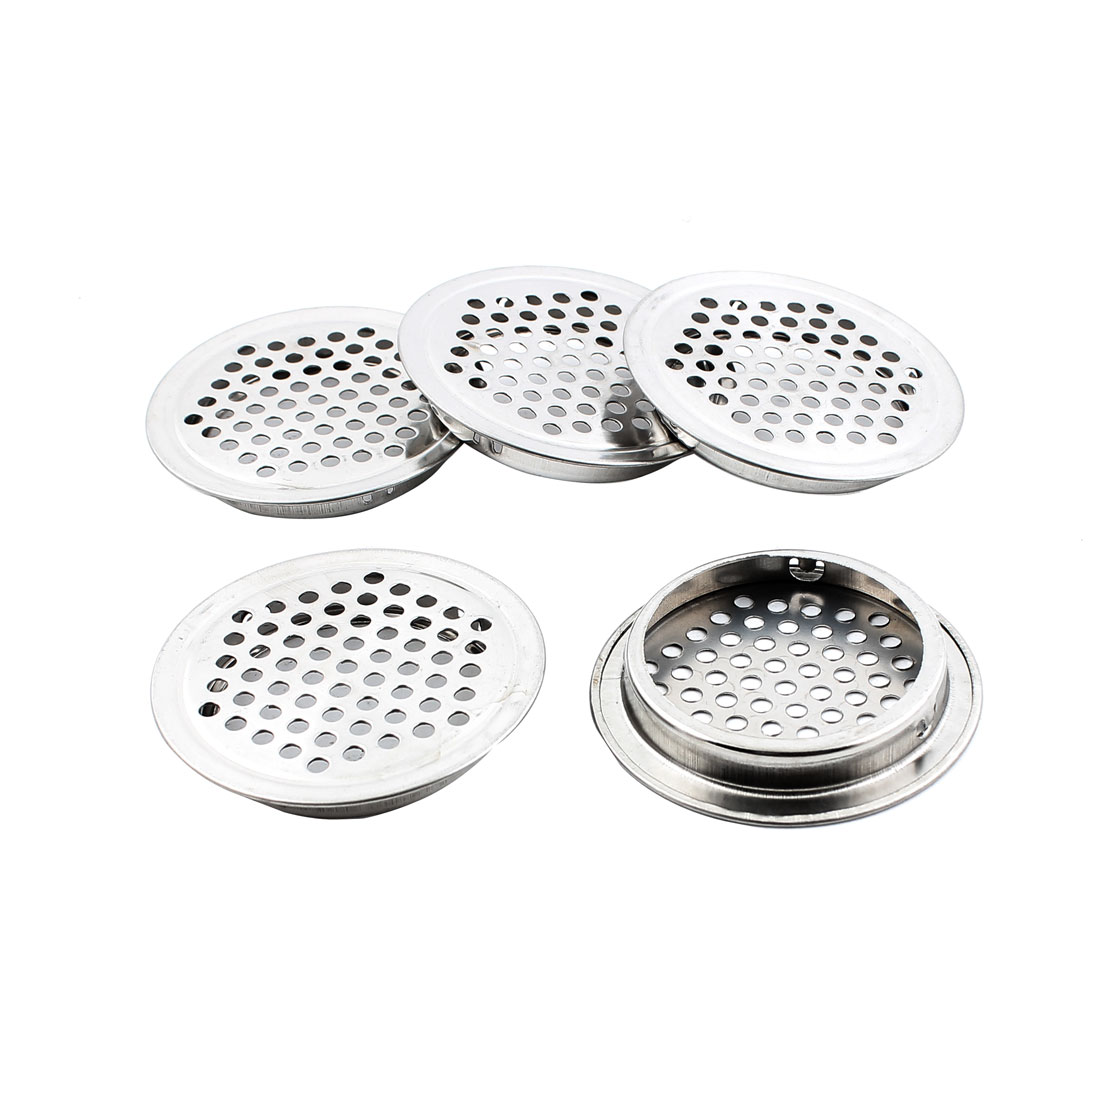 53mm Bottom Dia Perforated Metal Round Mesh Air Vents Ventilation 5PCS